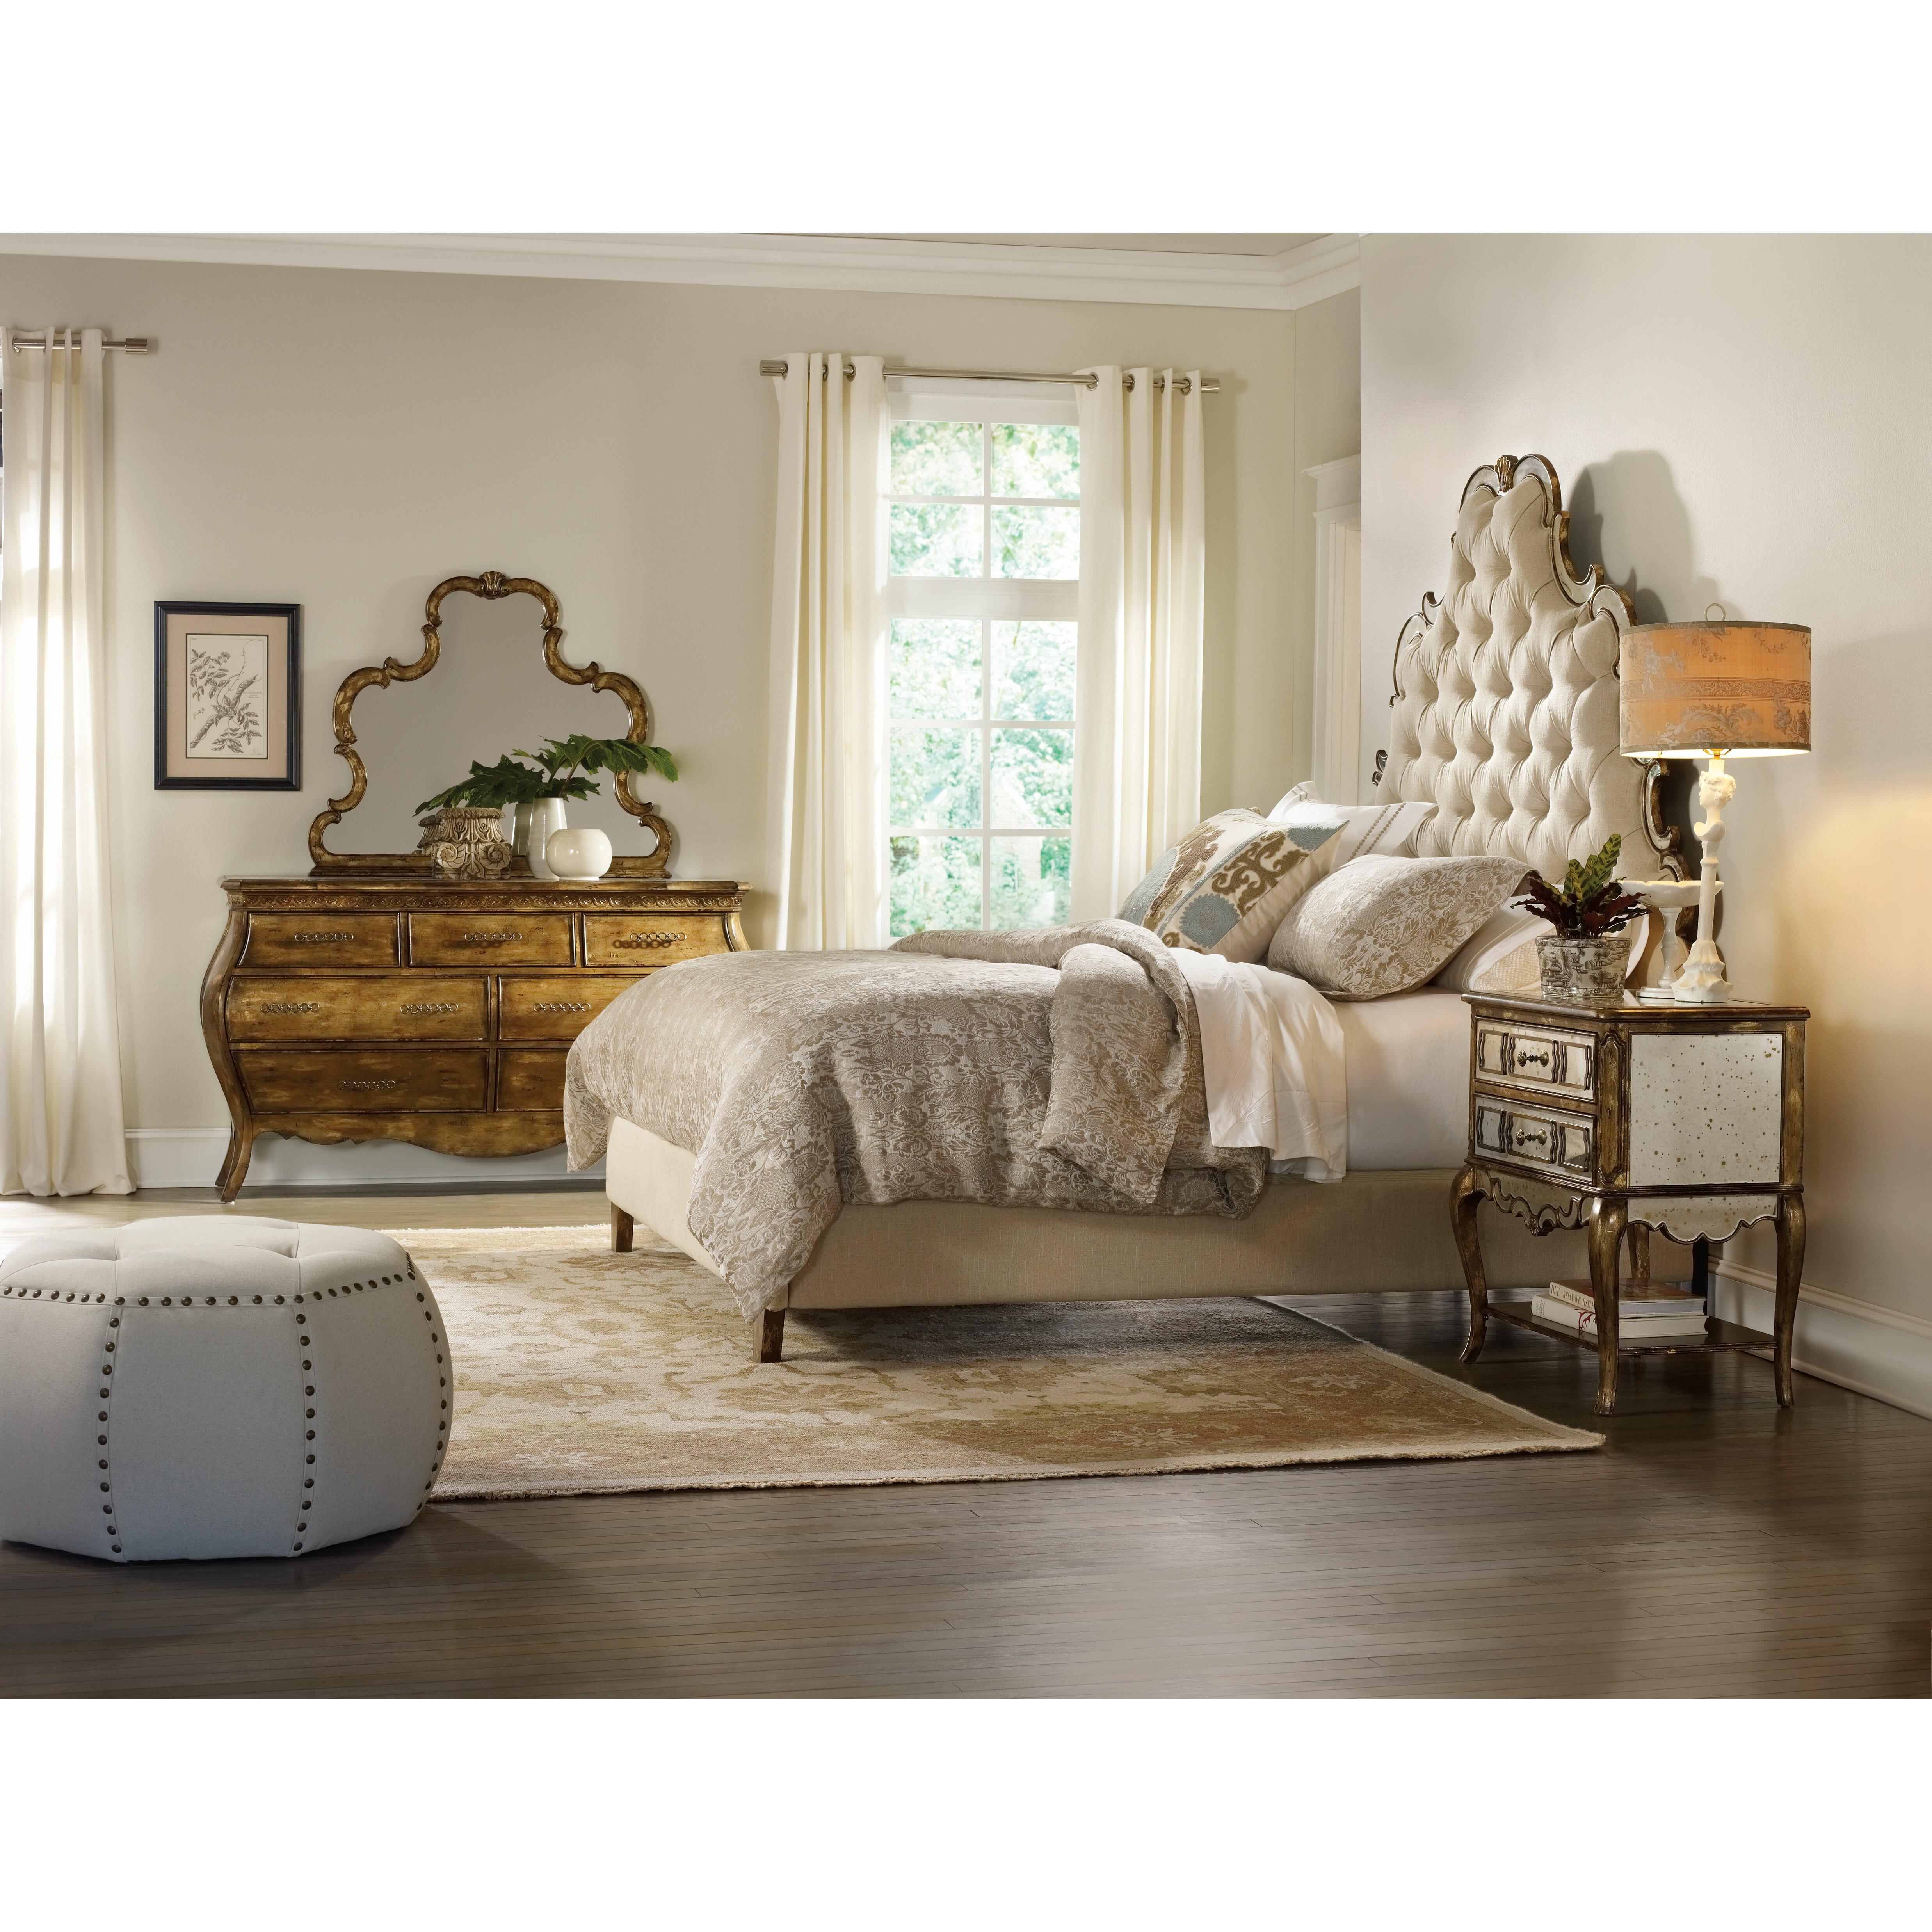 Hooker Furniture Sanctuary Upholstered Headboard & Reviews